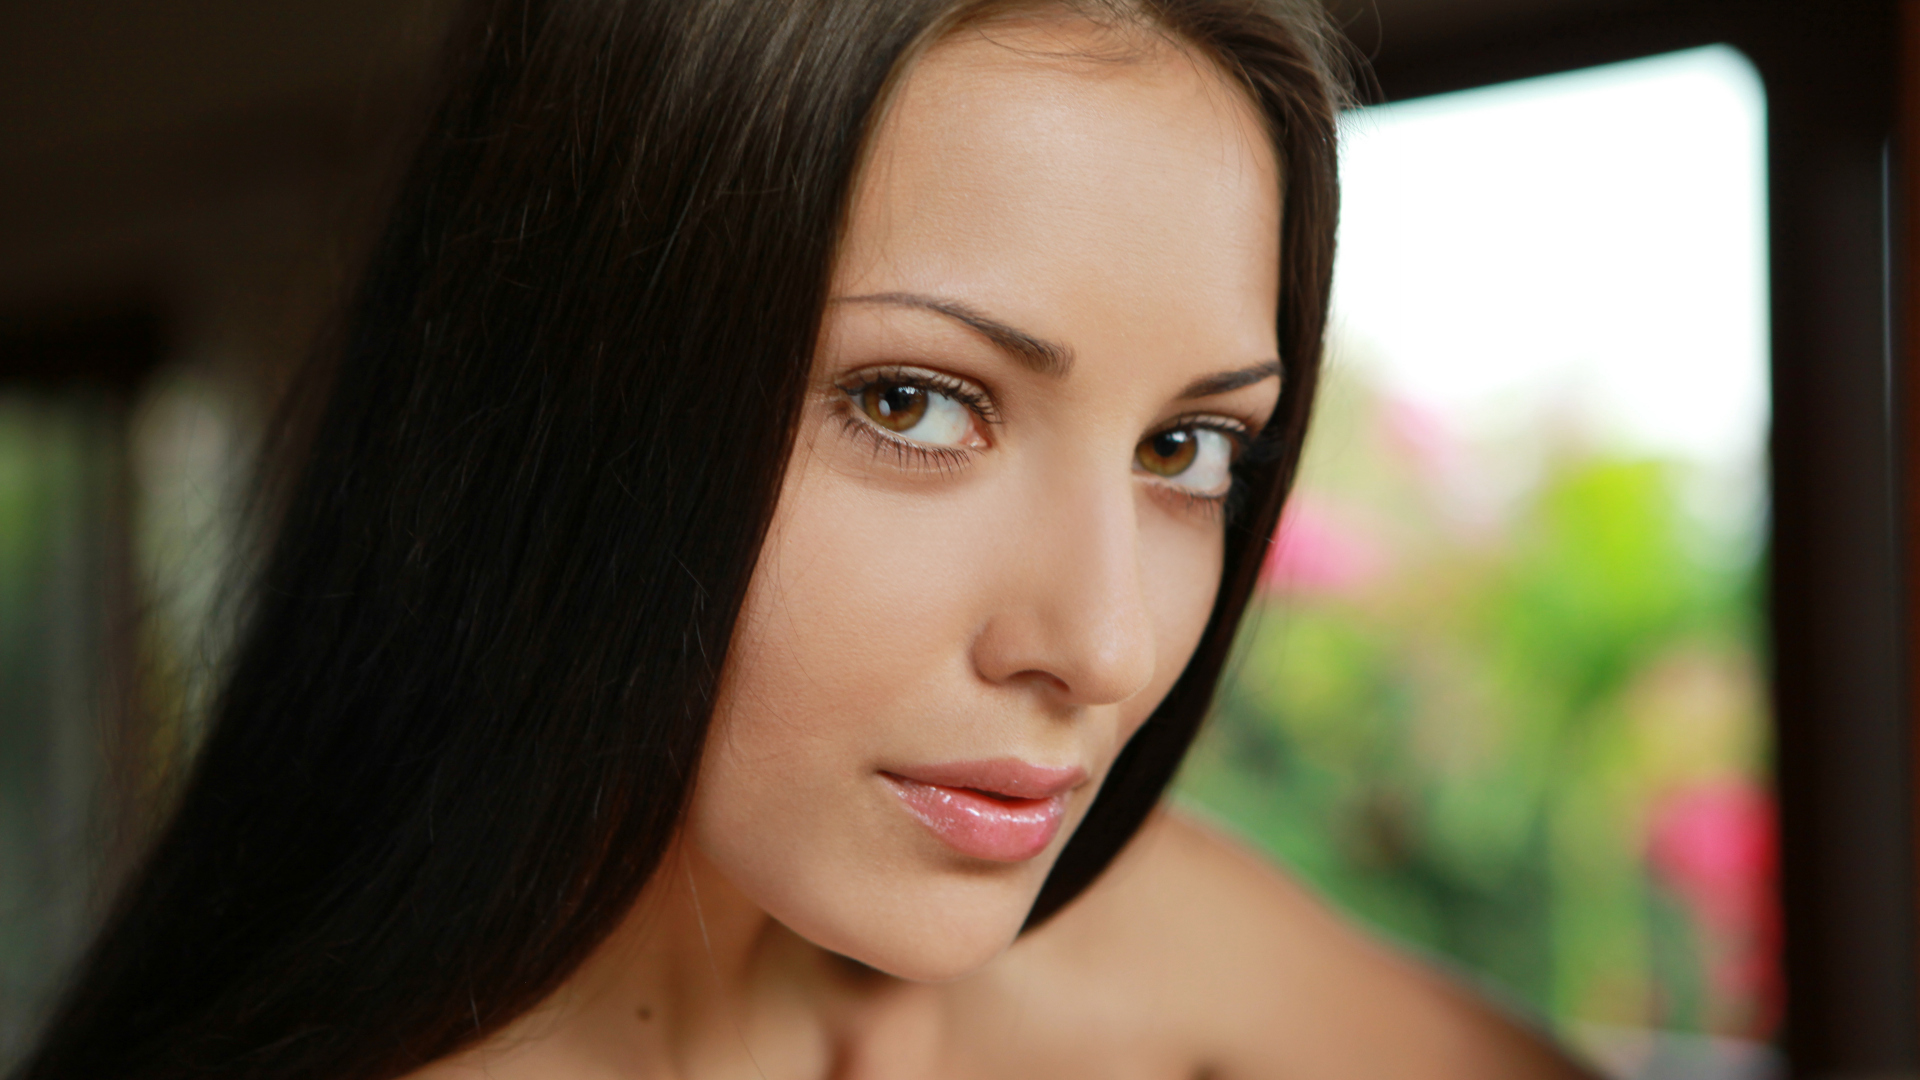 Anna Sbitnaya Pictures. Hotness Rating = 8.98/10